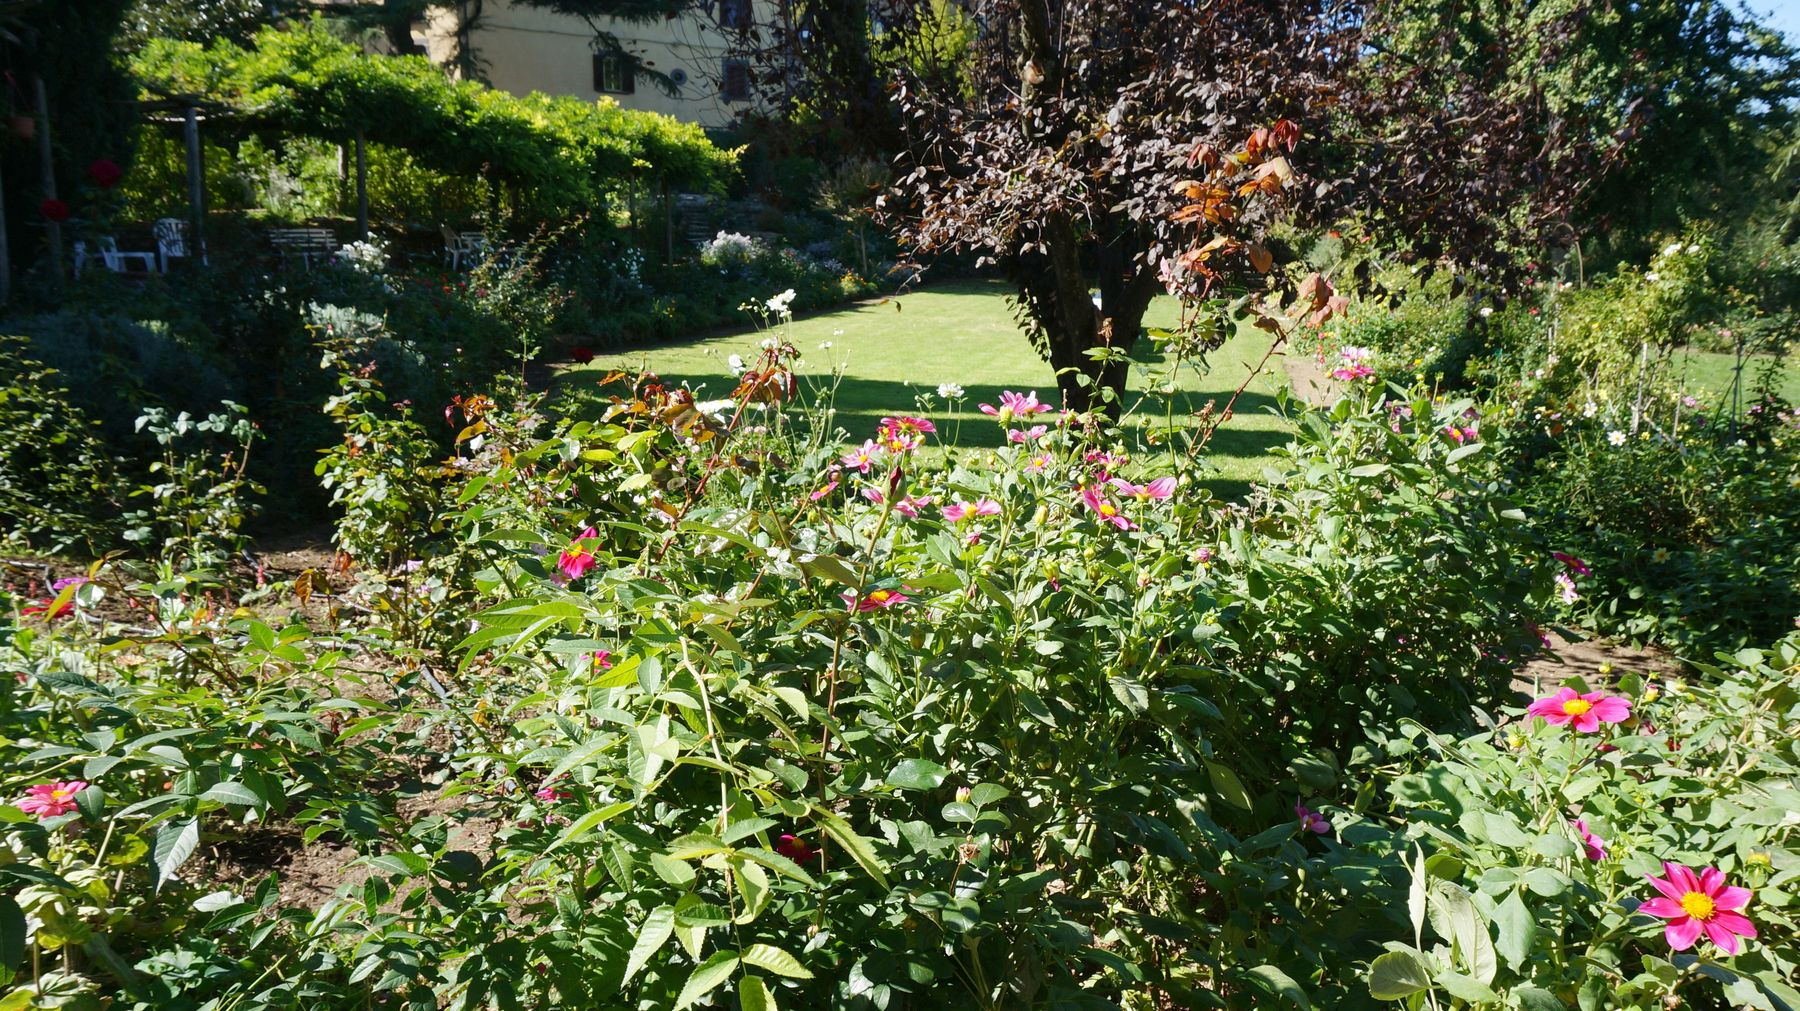 Architettura giardini blossom zine blog for Architettura giardini